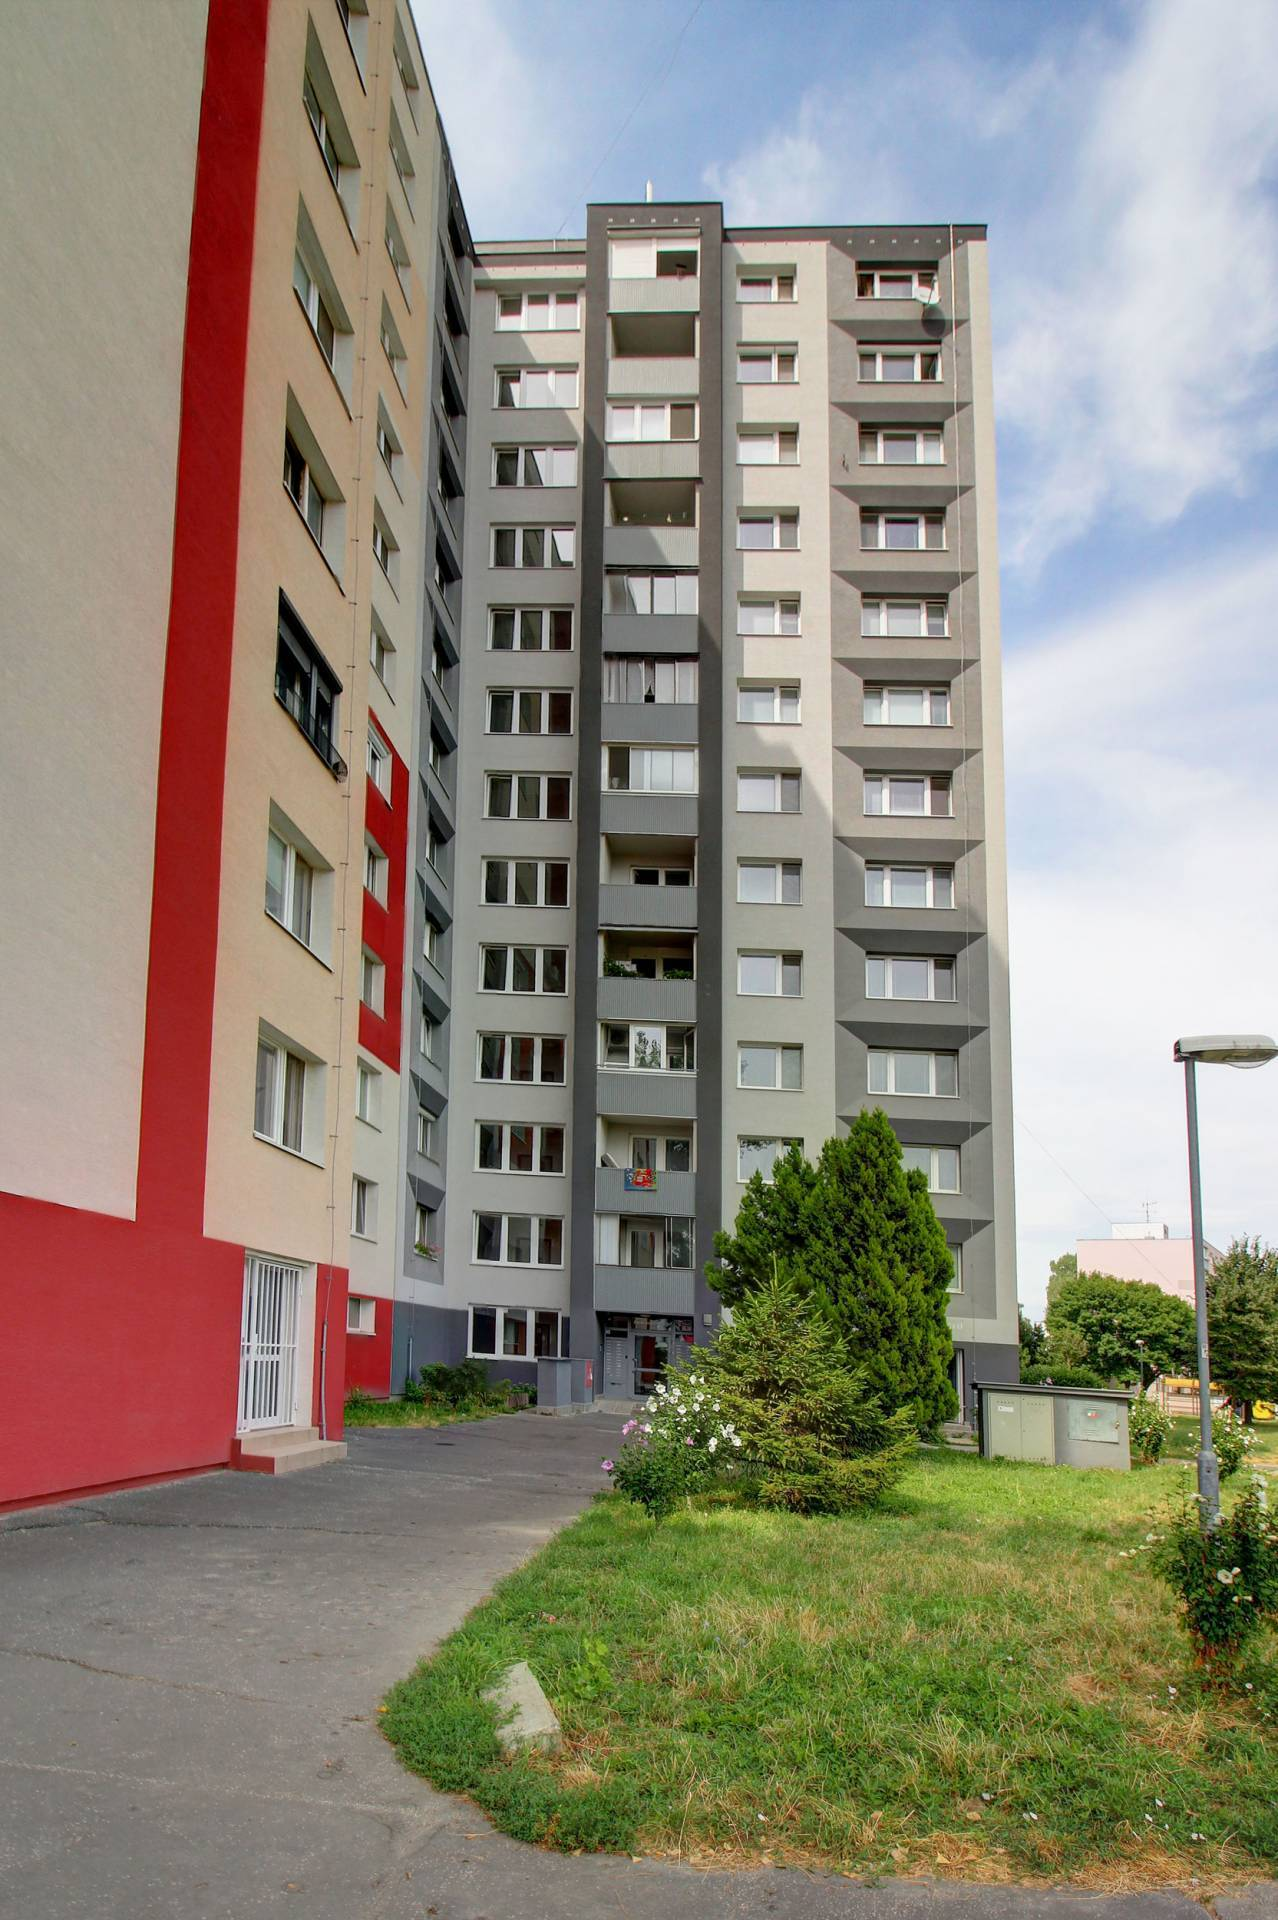 Na predaj: 3 izbový byt 66m2, Bratislava - Petržalka, Andrusovova ulica